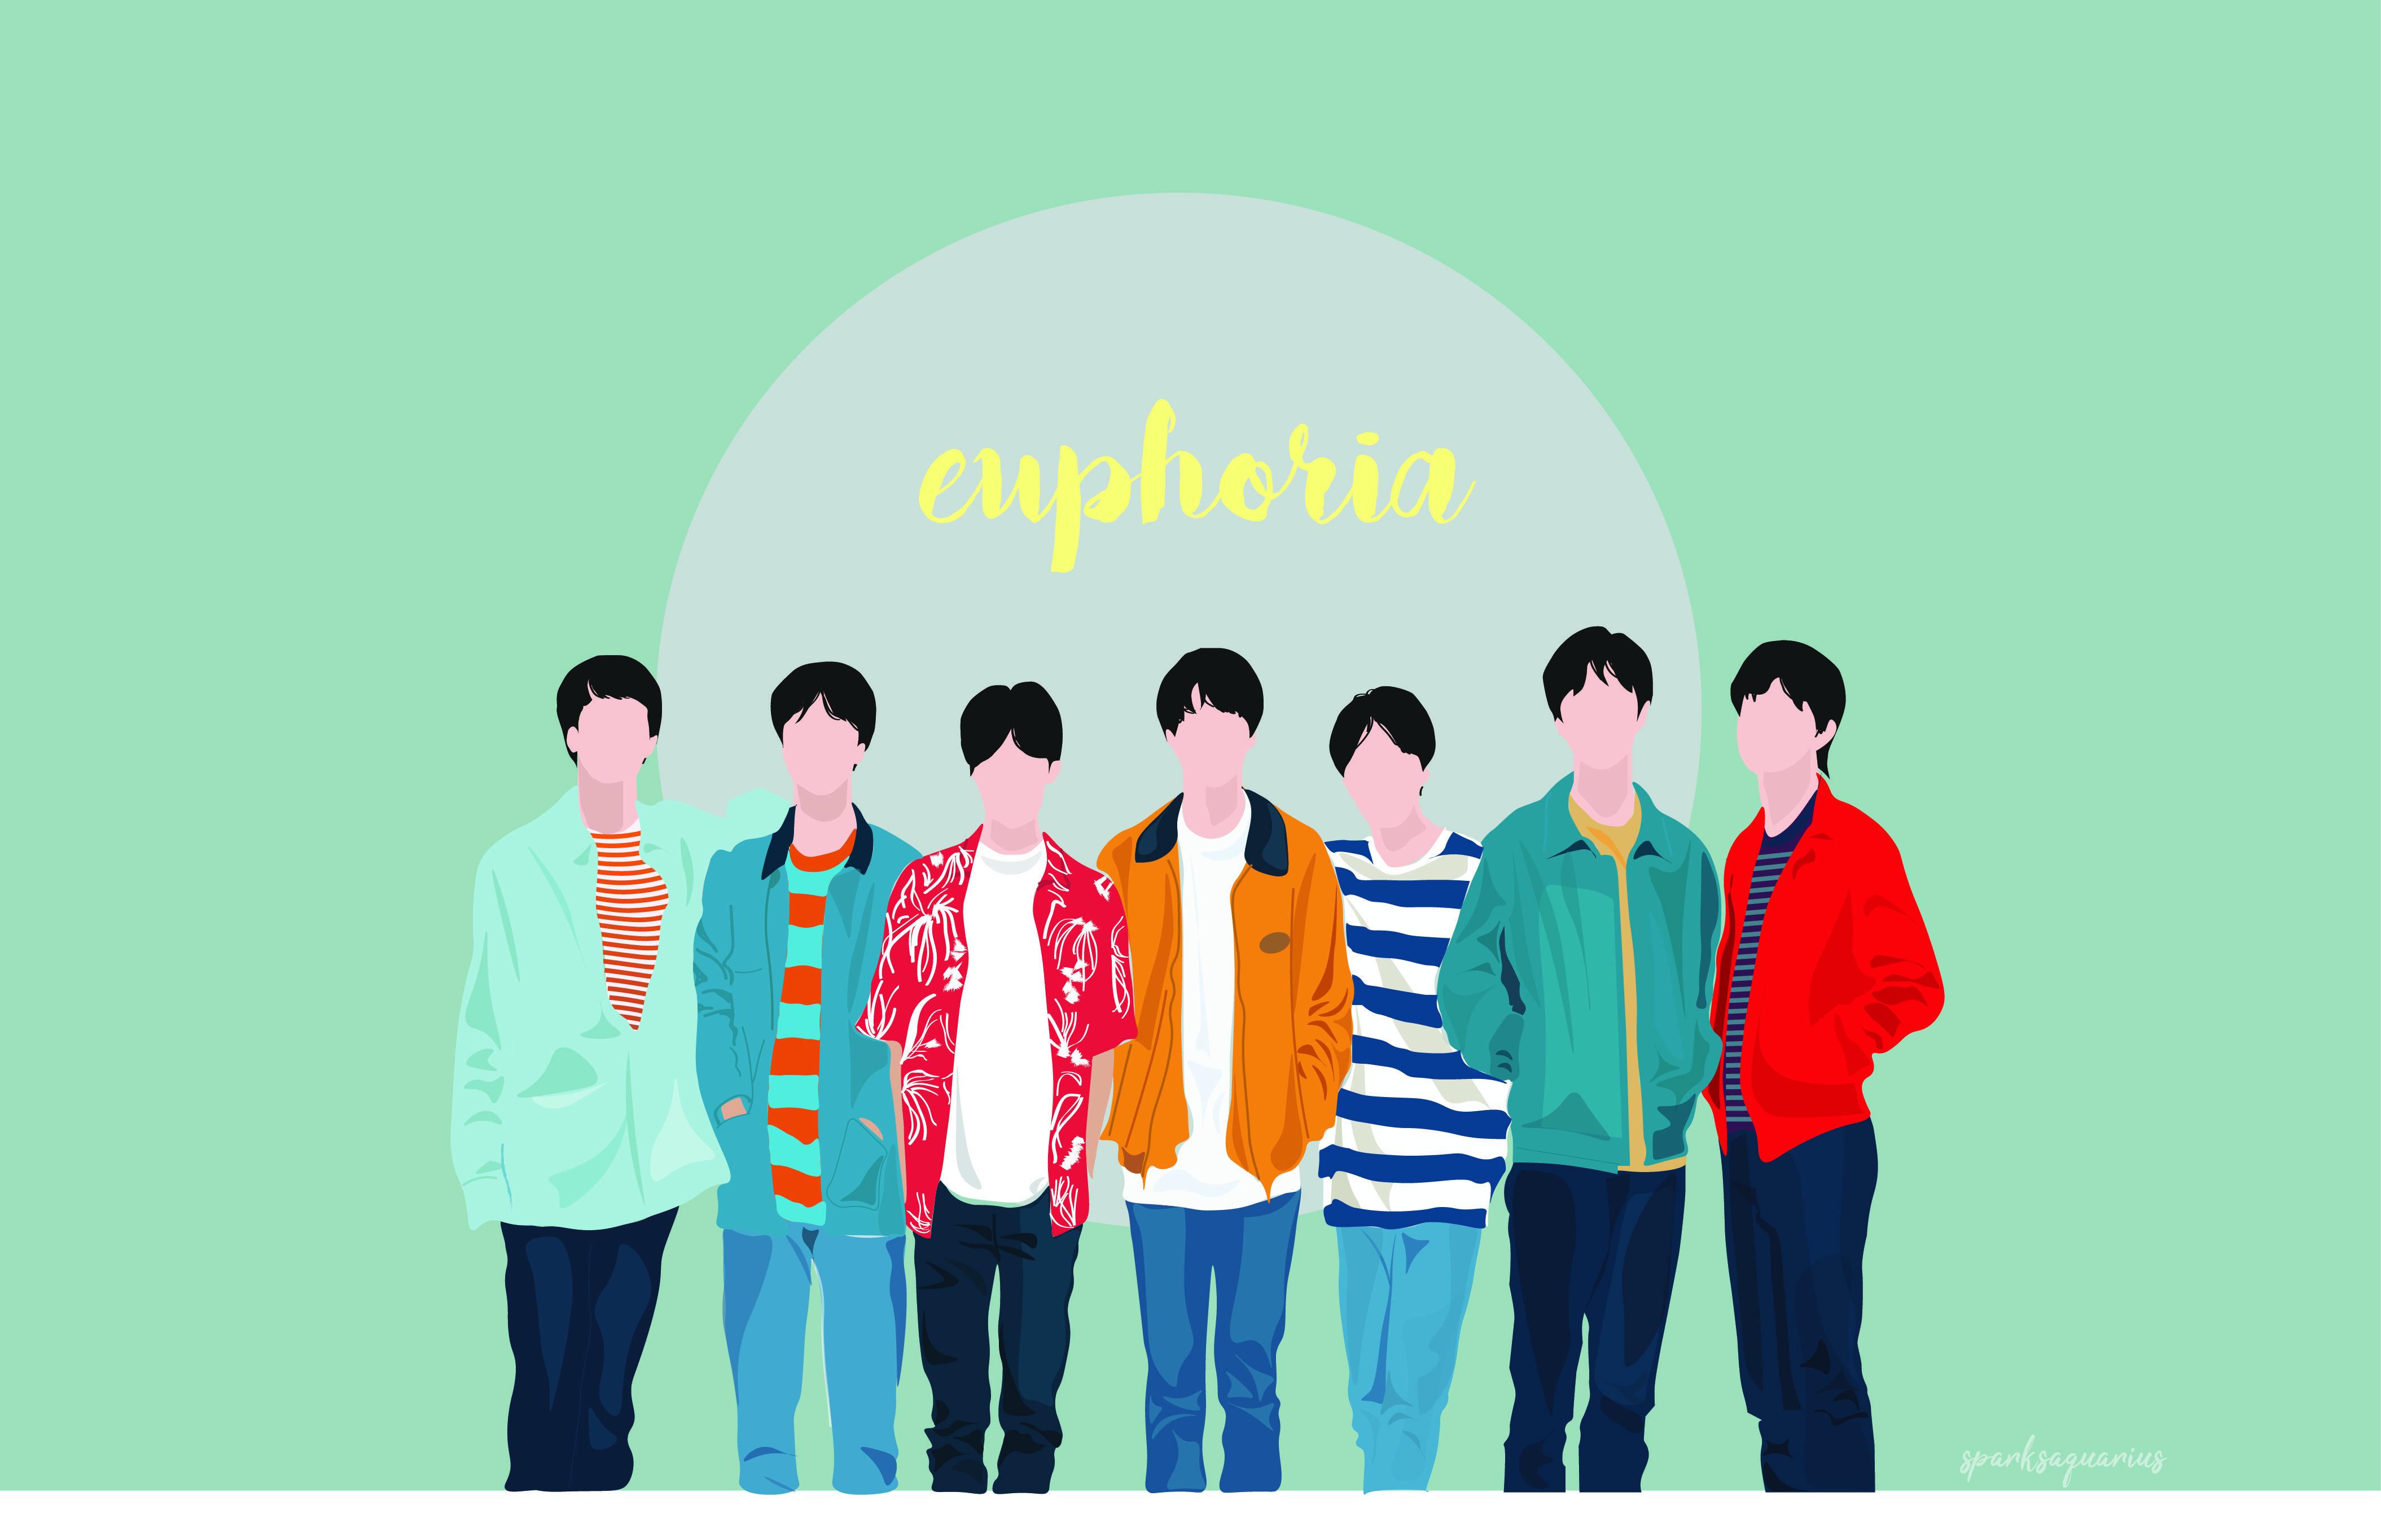 Bts Euphoria Vector Bts Bangtanboys Vector Wallpaper Lockscreen Jimin Taehyung Rapmonster Jin Jhope Suga Jungk Bts Fanart Bts Wallpaper Wallpaper Bts euphoria wallpaper desktop